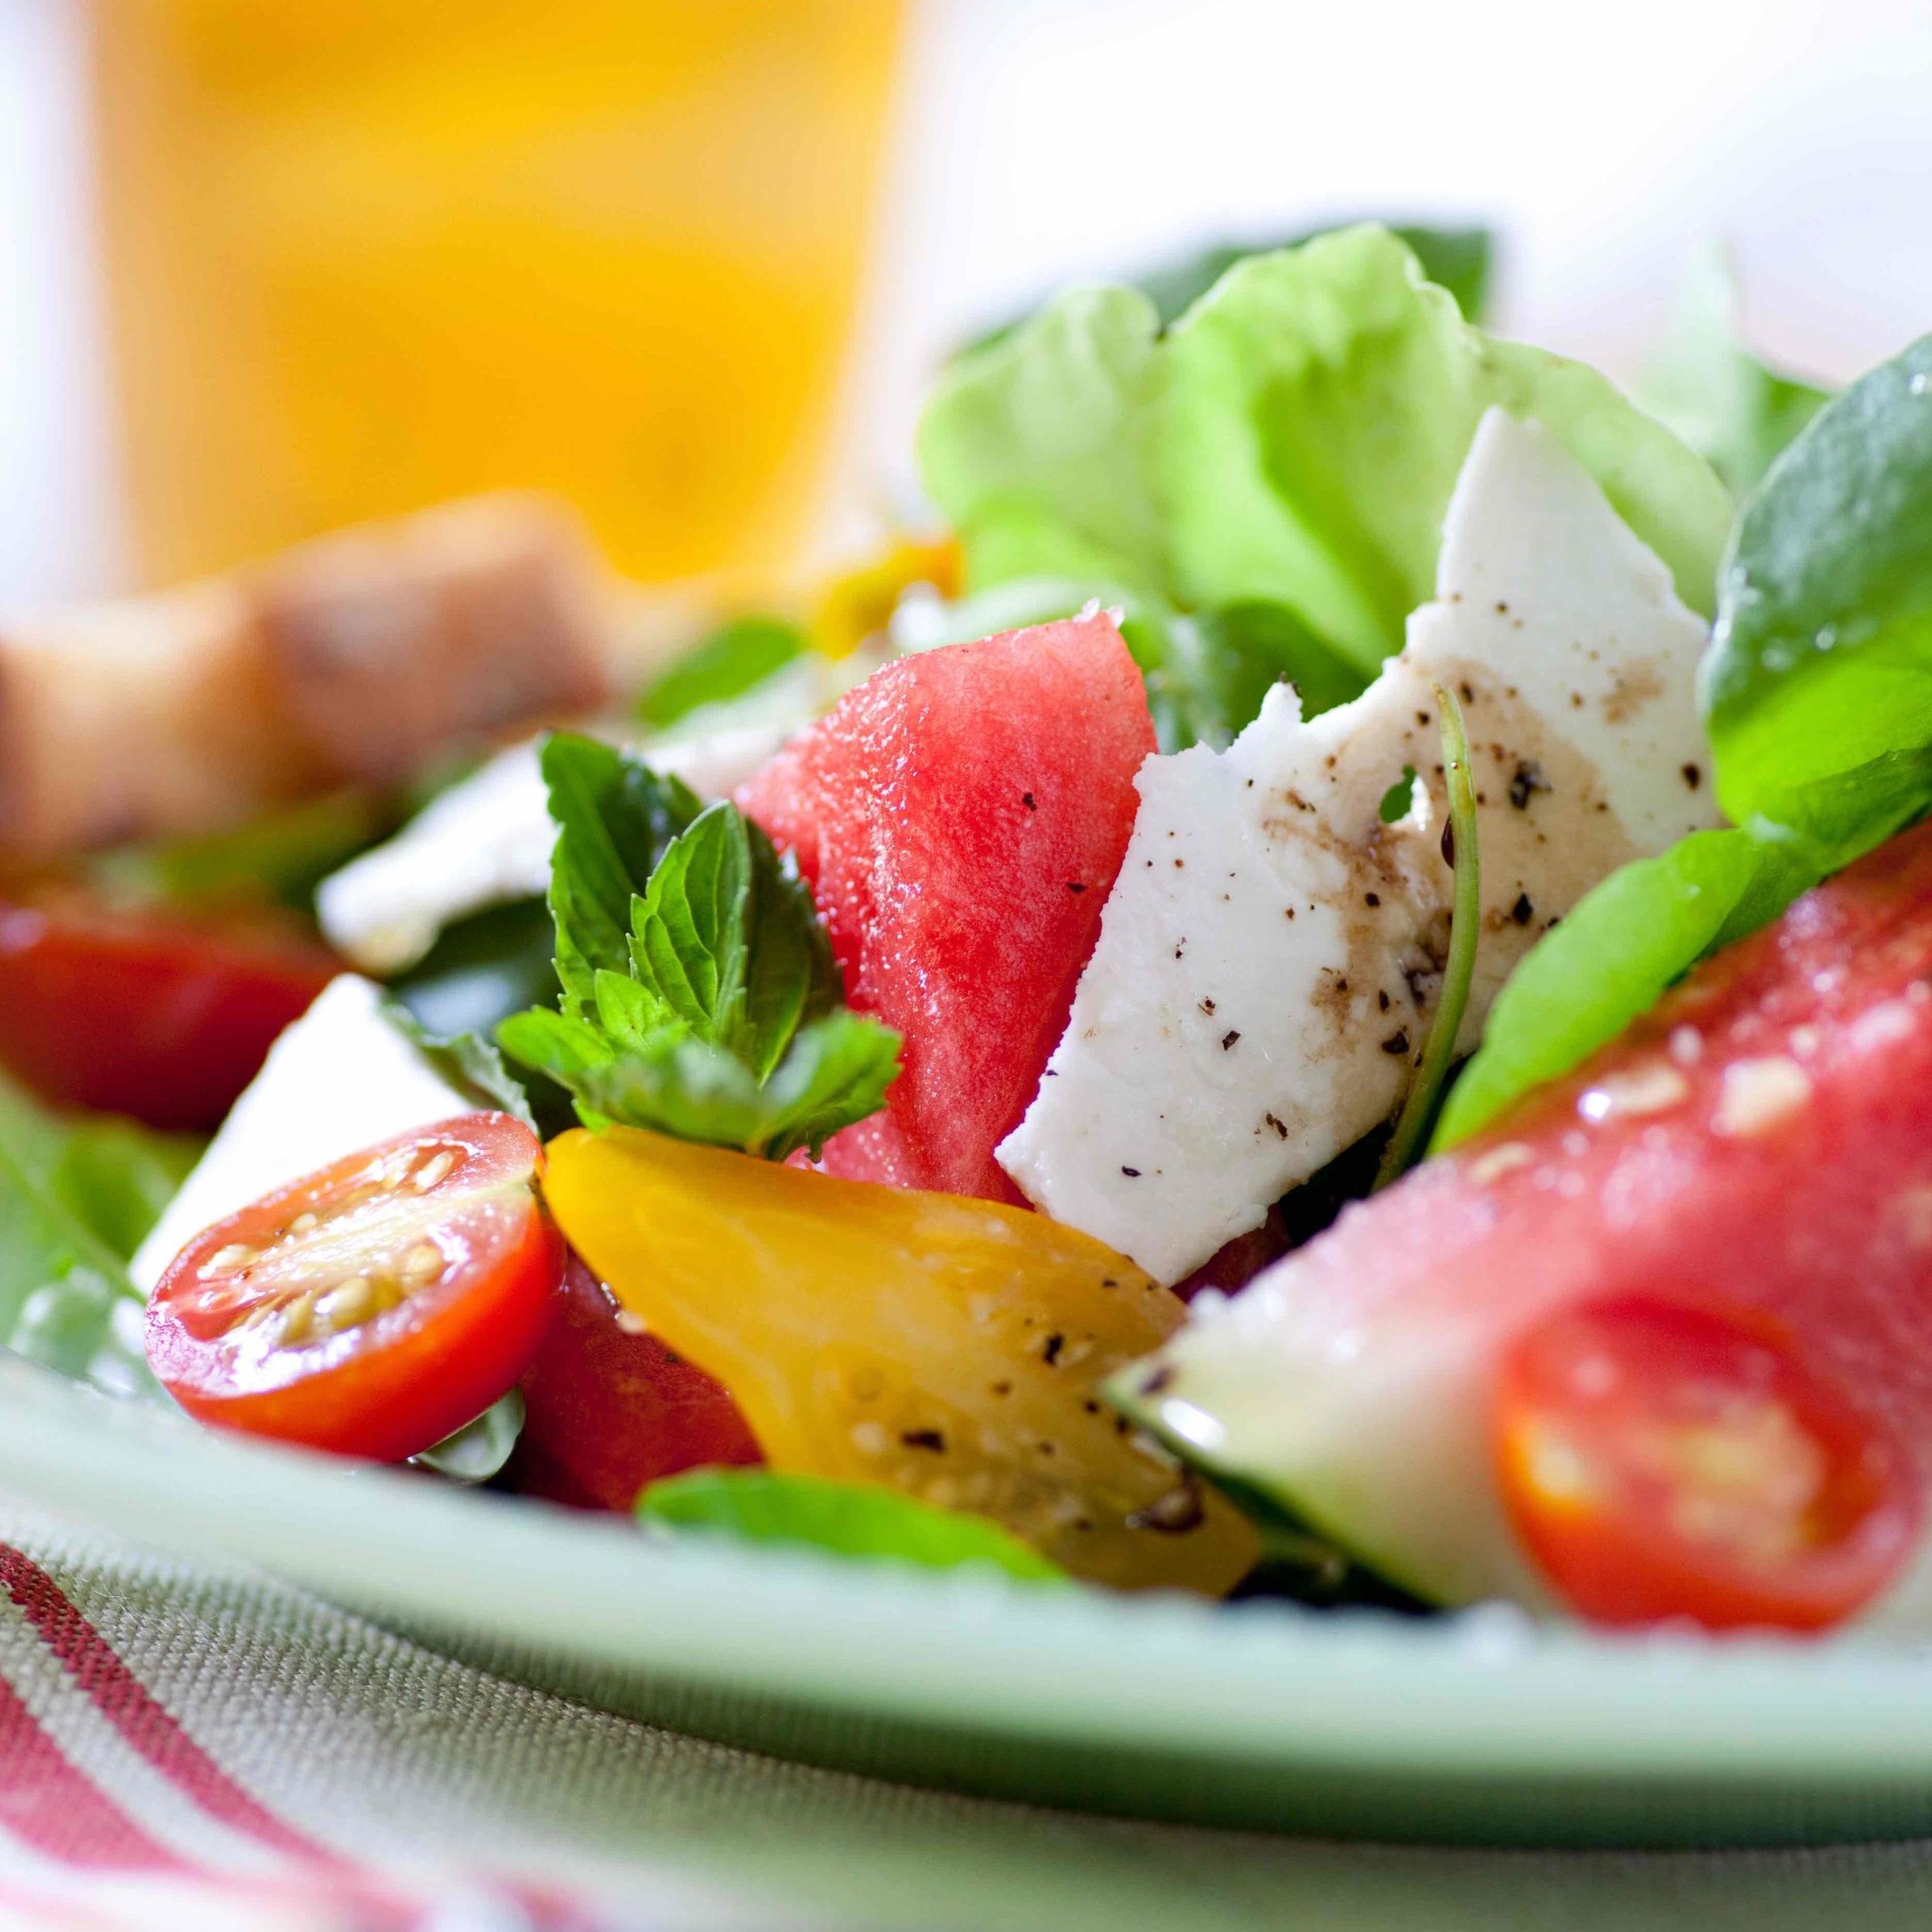 watermelon tomato salad with shaved feta-sara_shoot3_0353 copy.jpg